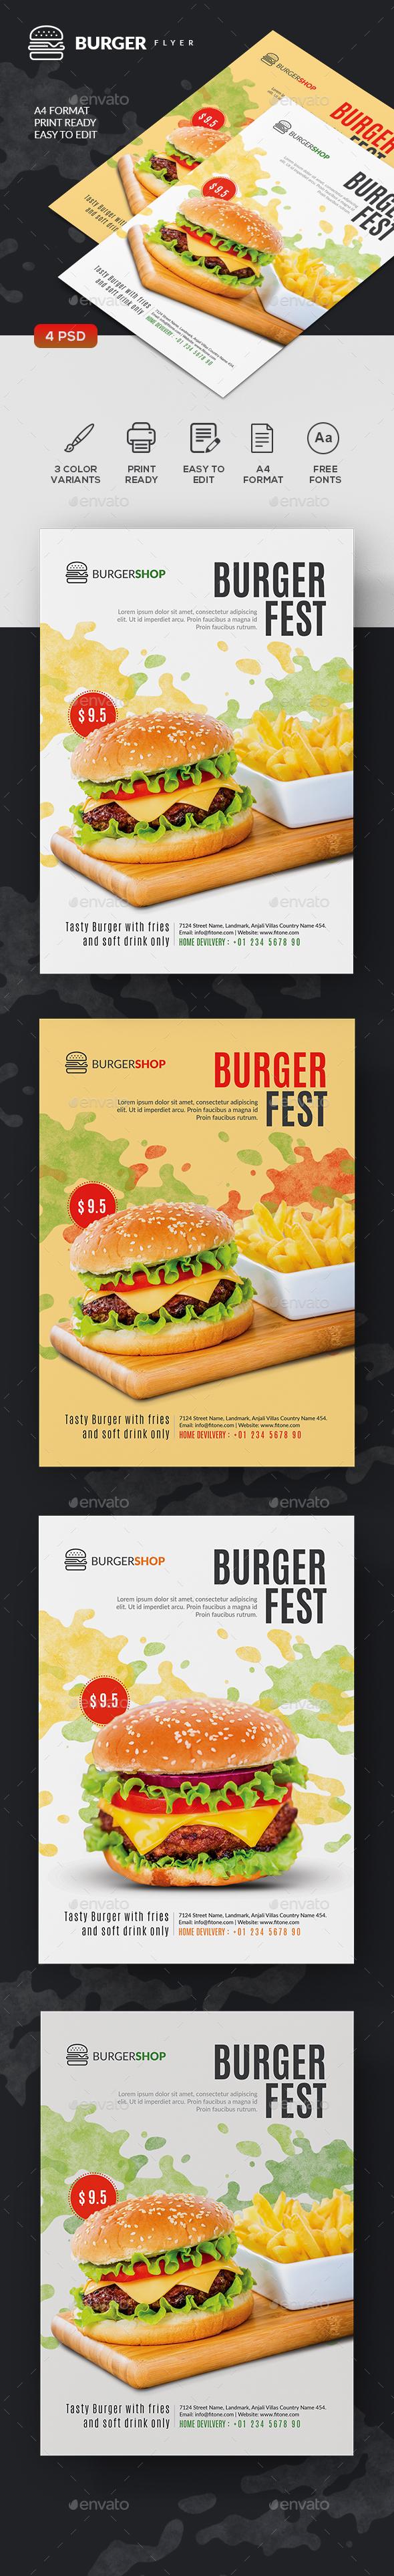 Burger Flyer Templates - Restaurant Flyers